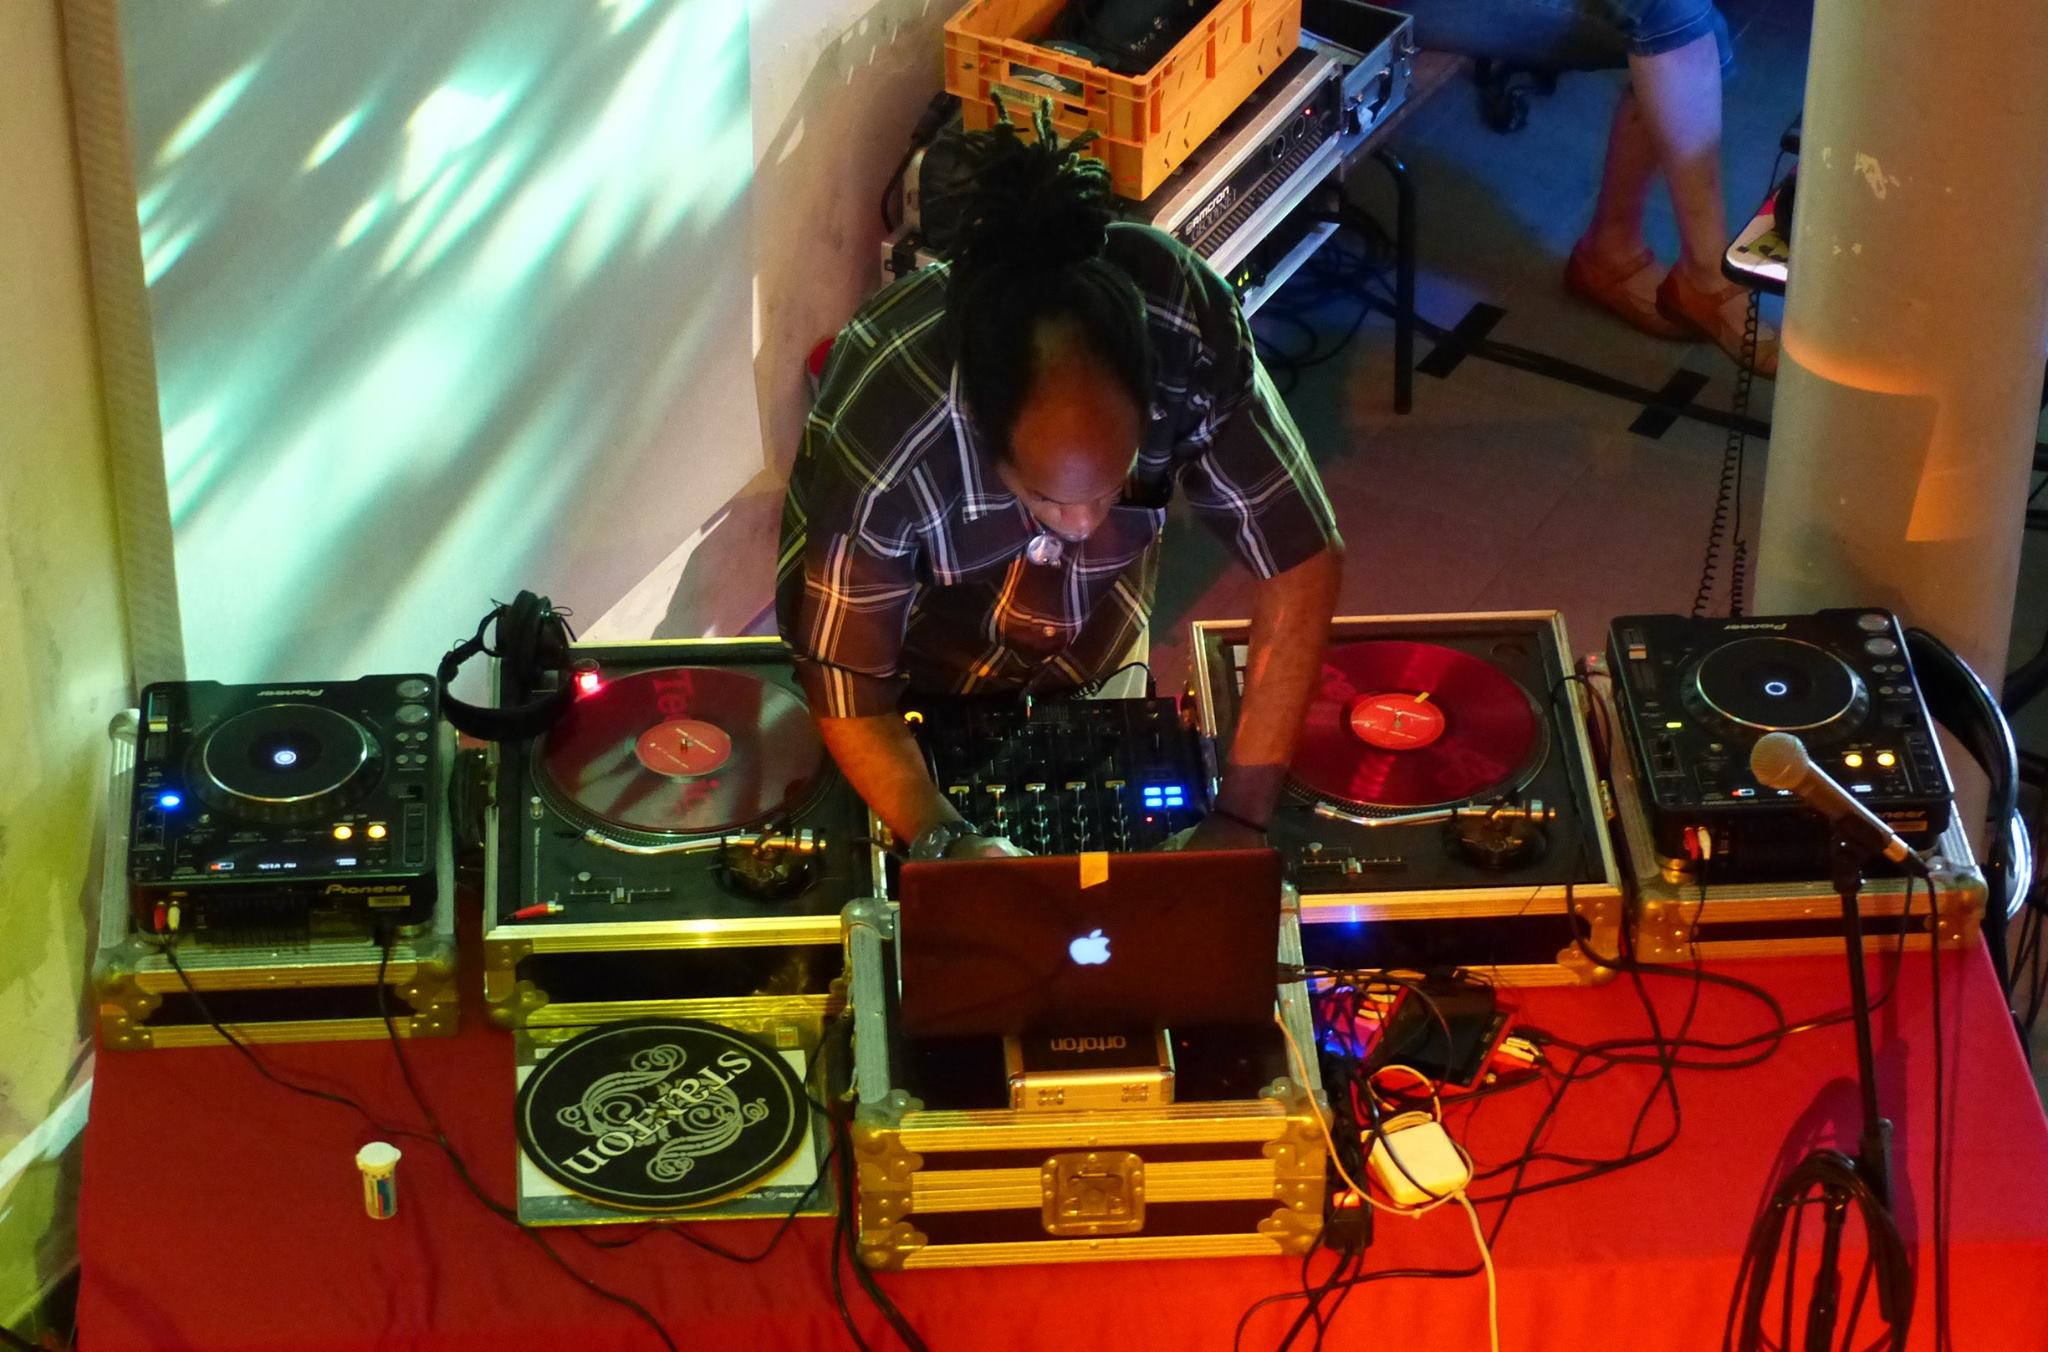 27 mai 2016 – Bal caribéen avec M. OaT & DJ Kako Phonie